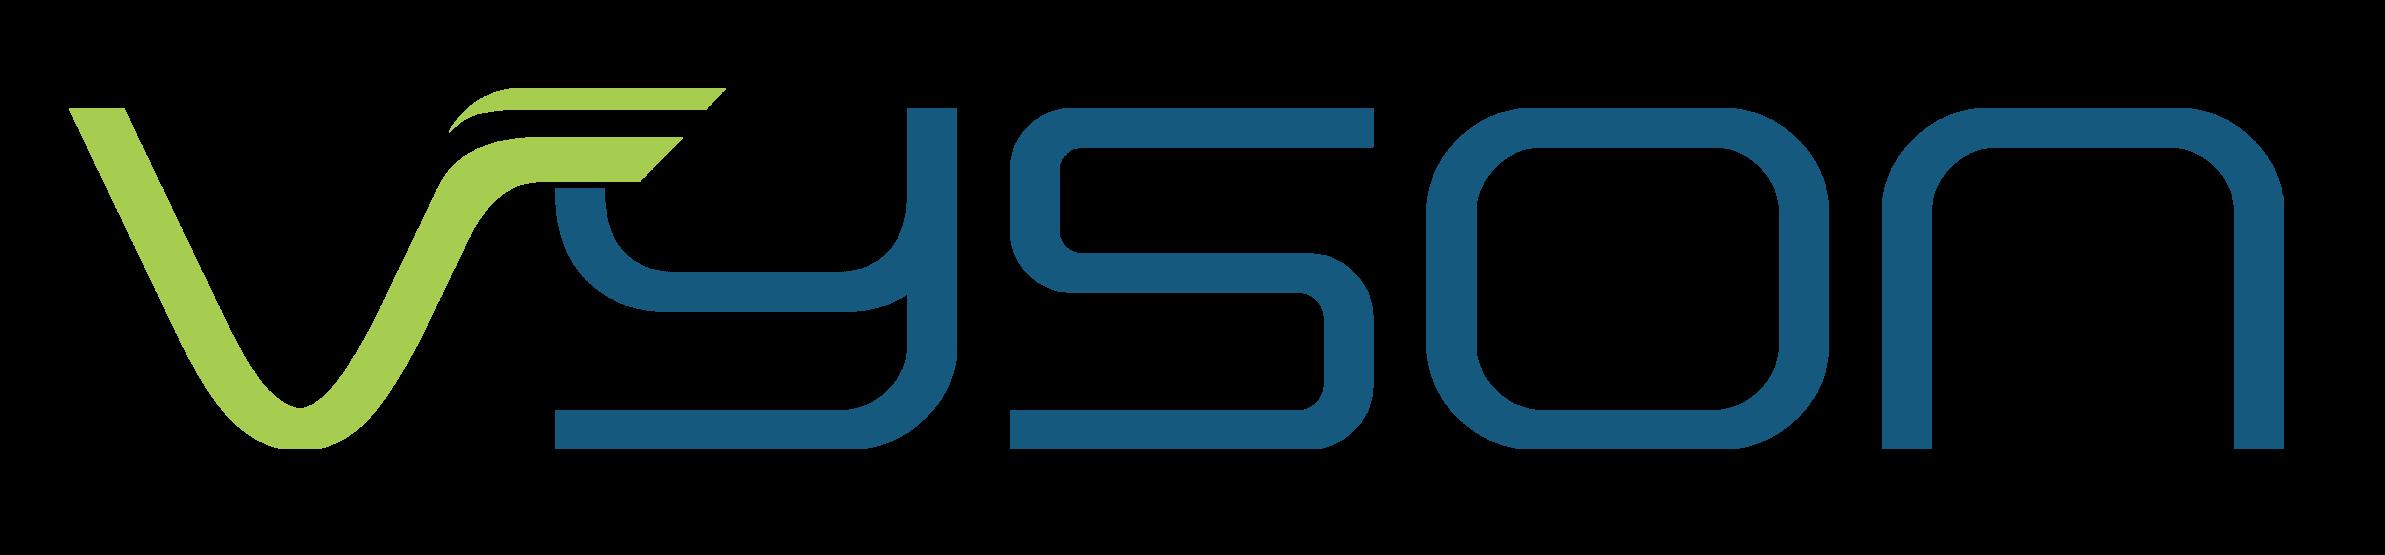 vyson GmbH